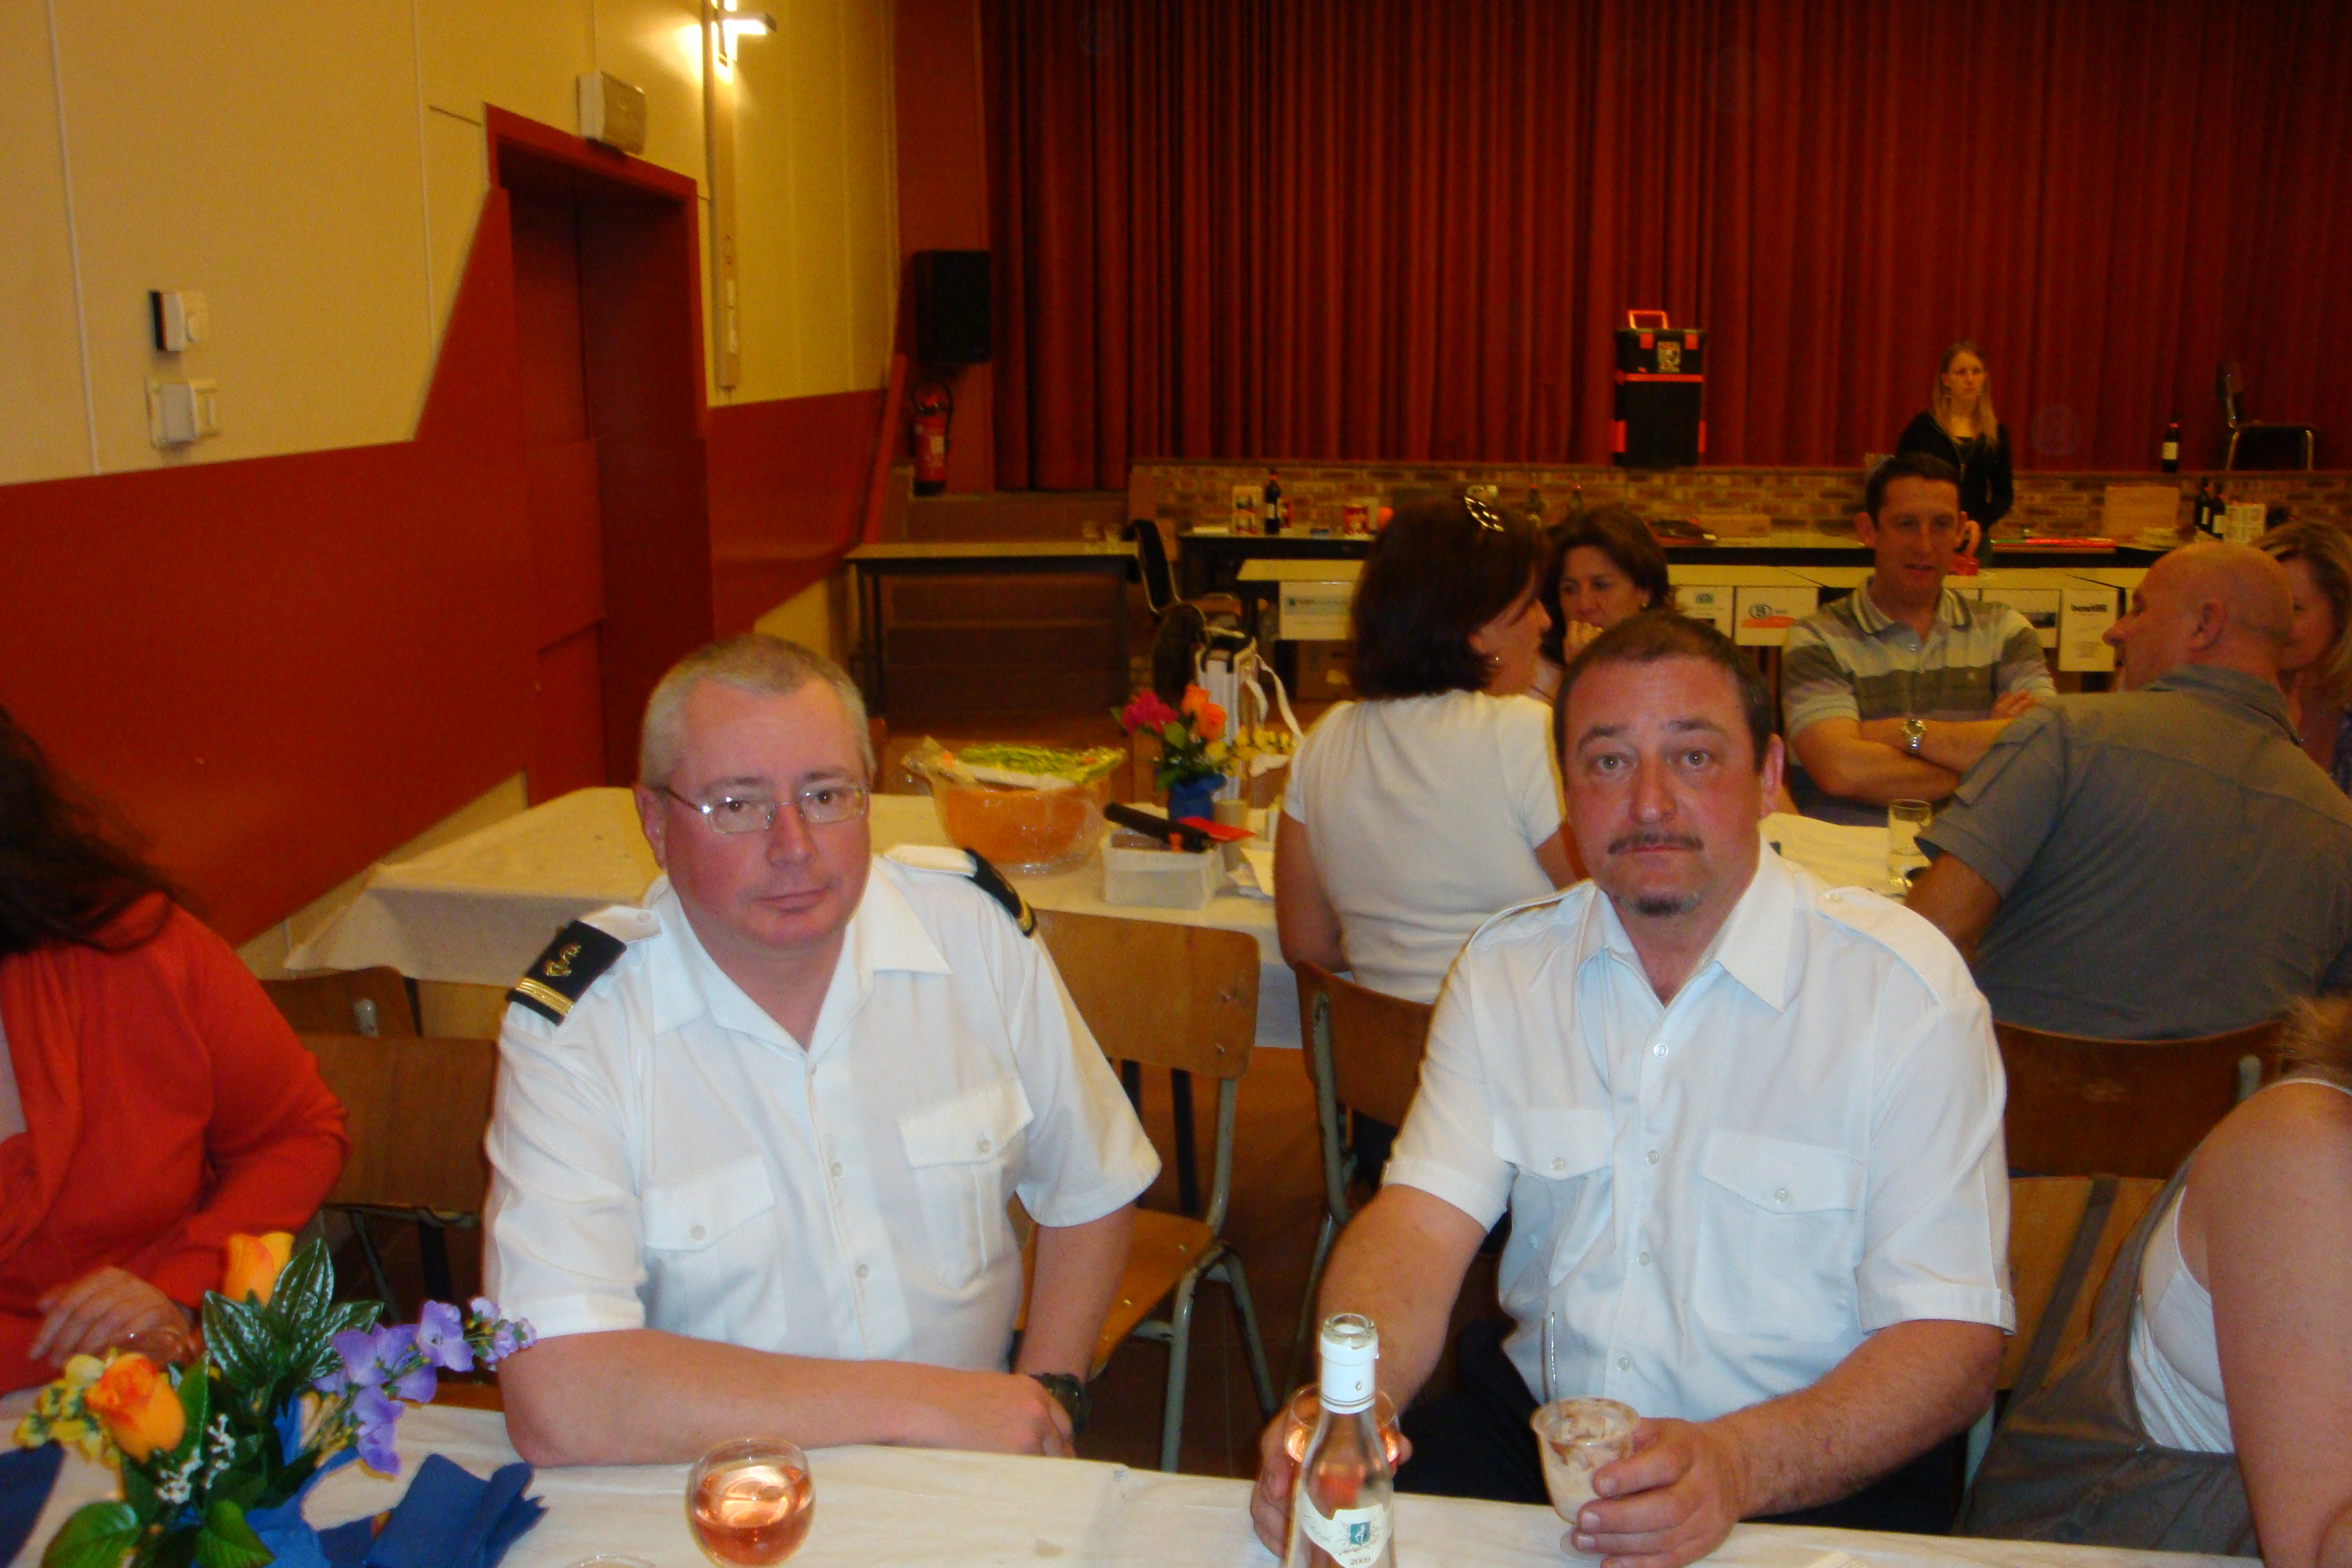 repas des cadets le 24/04/2010 100425094507990285899970